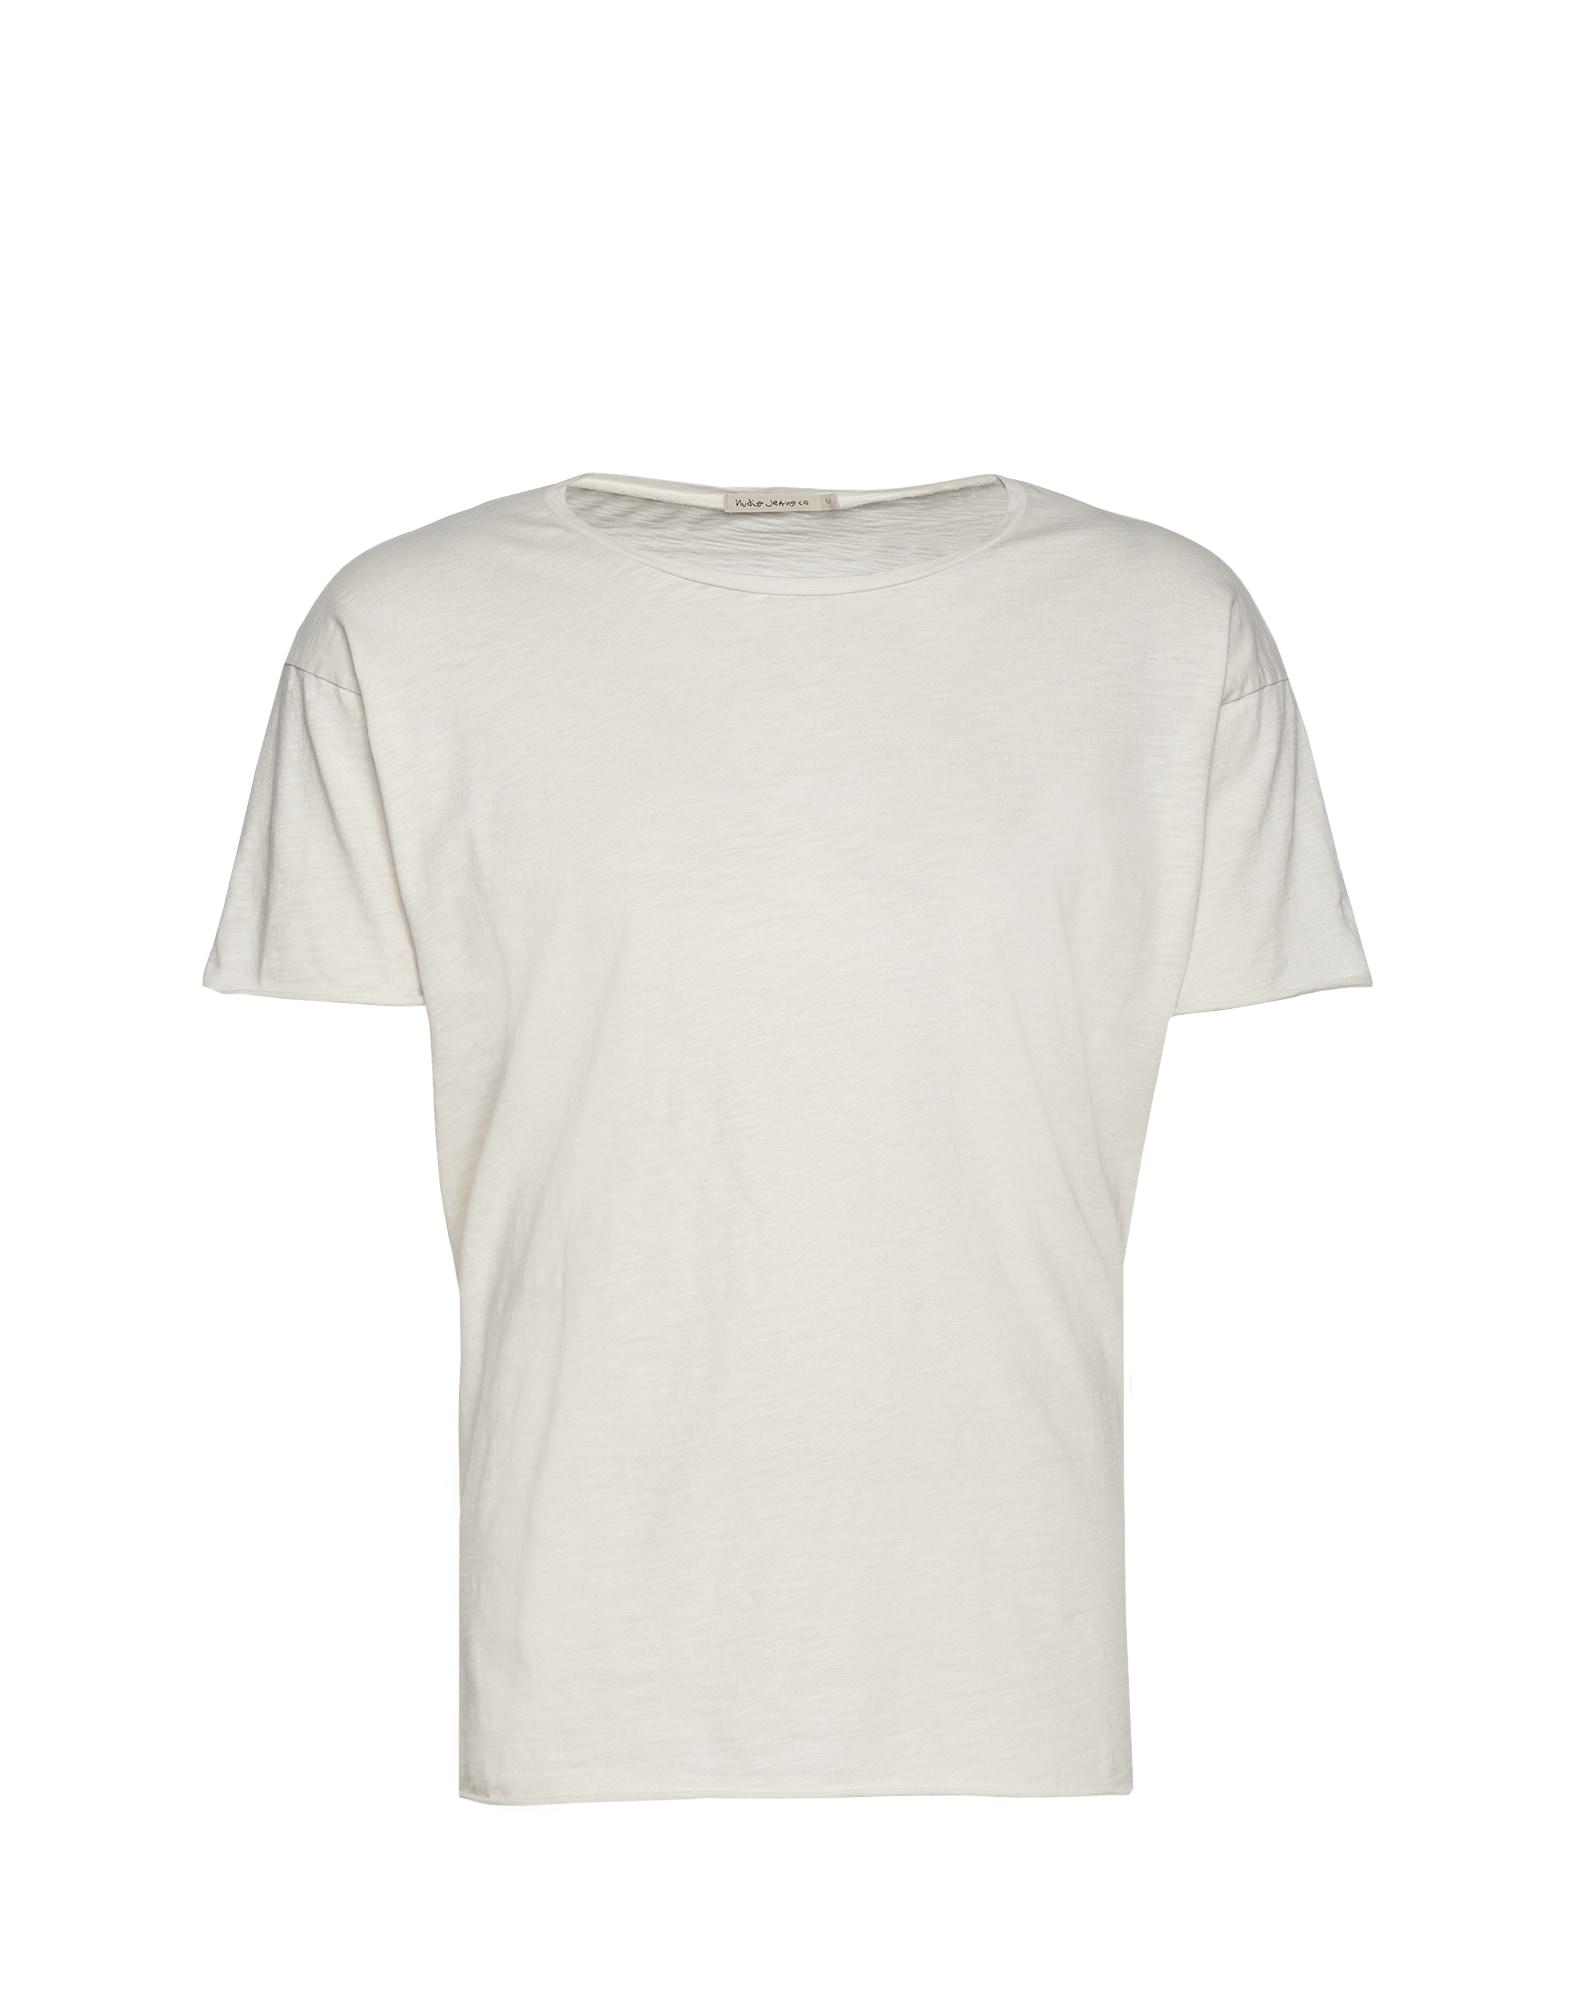 Nudie Jeans Co Marškinėliai 'Roger Slub' balkšva